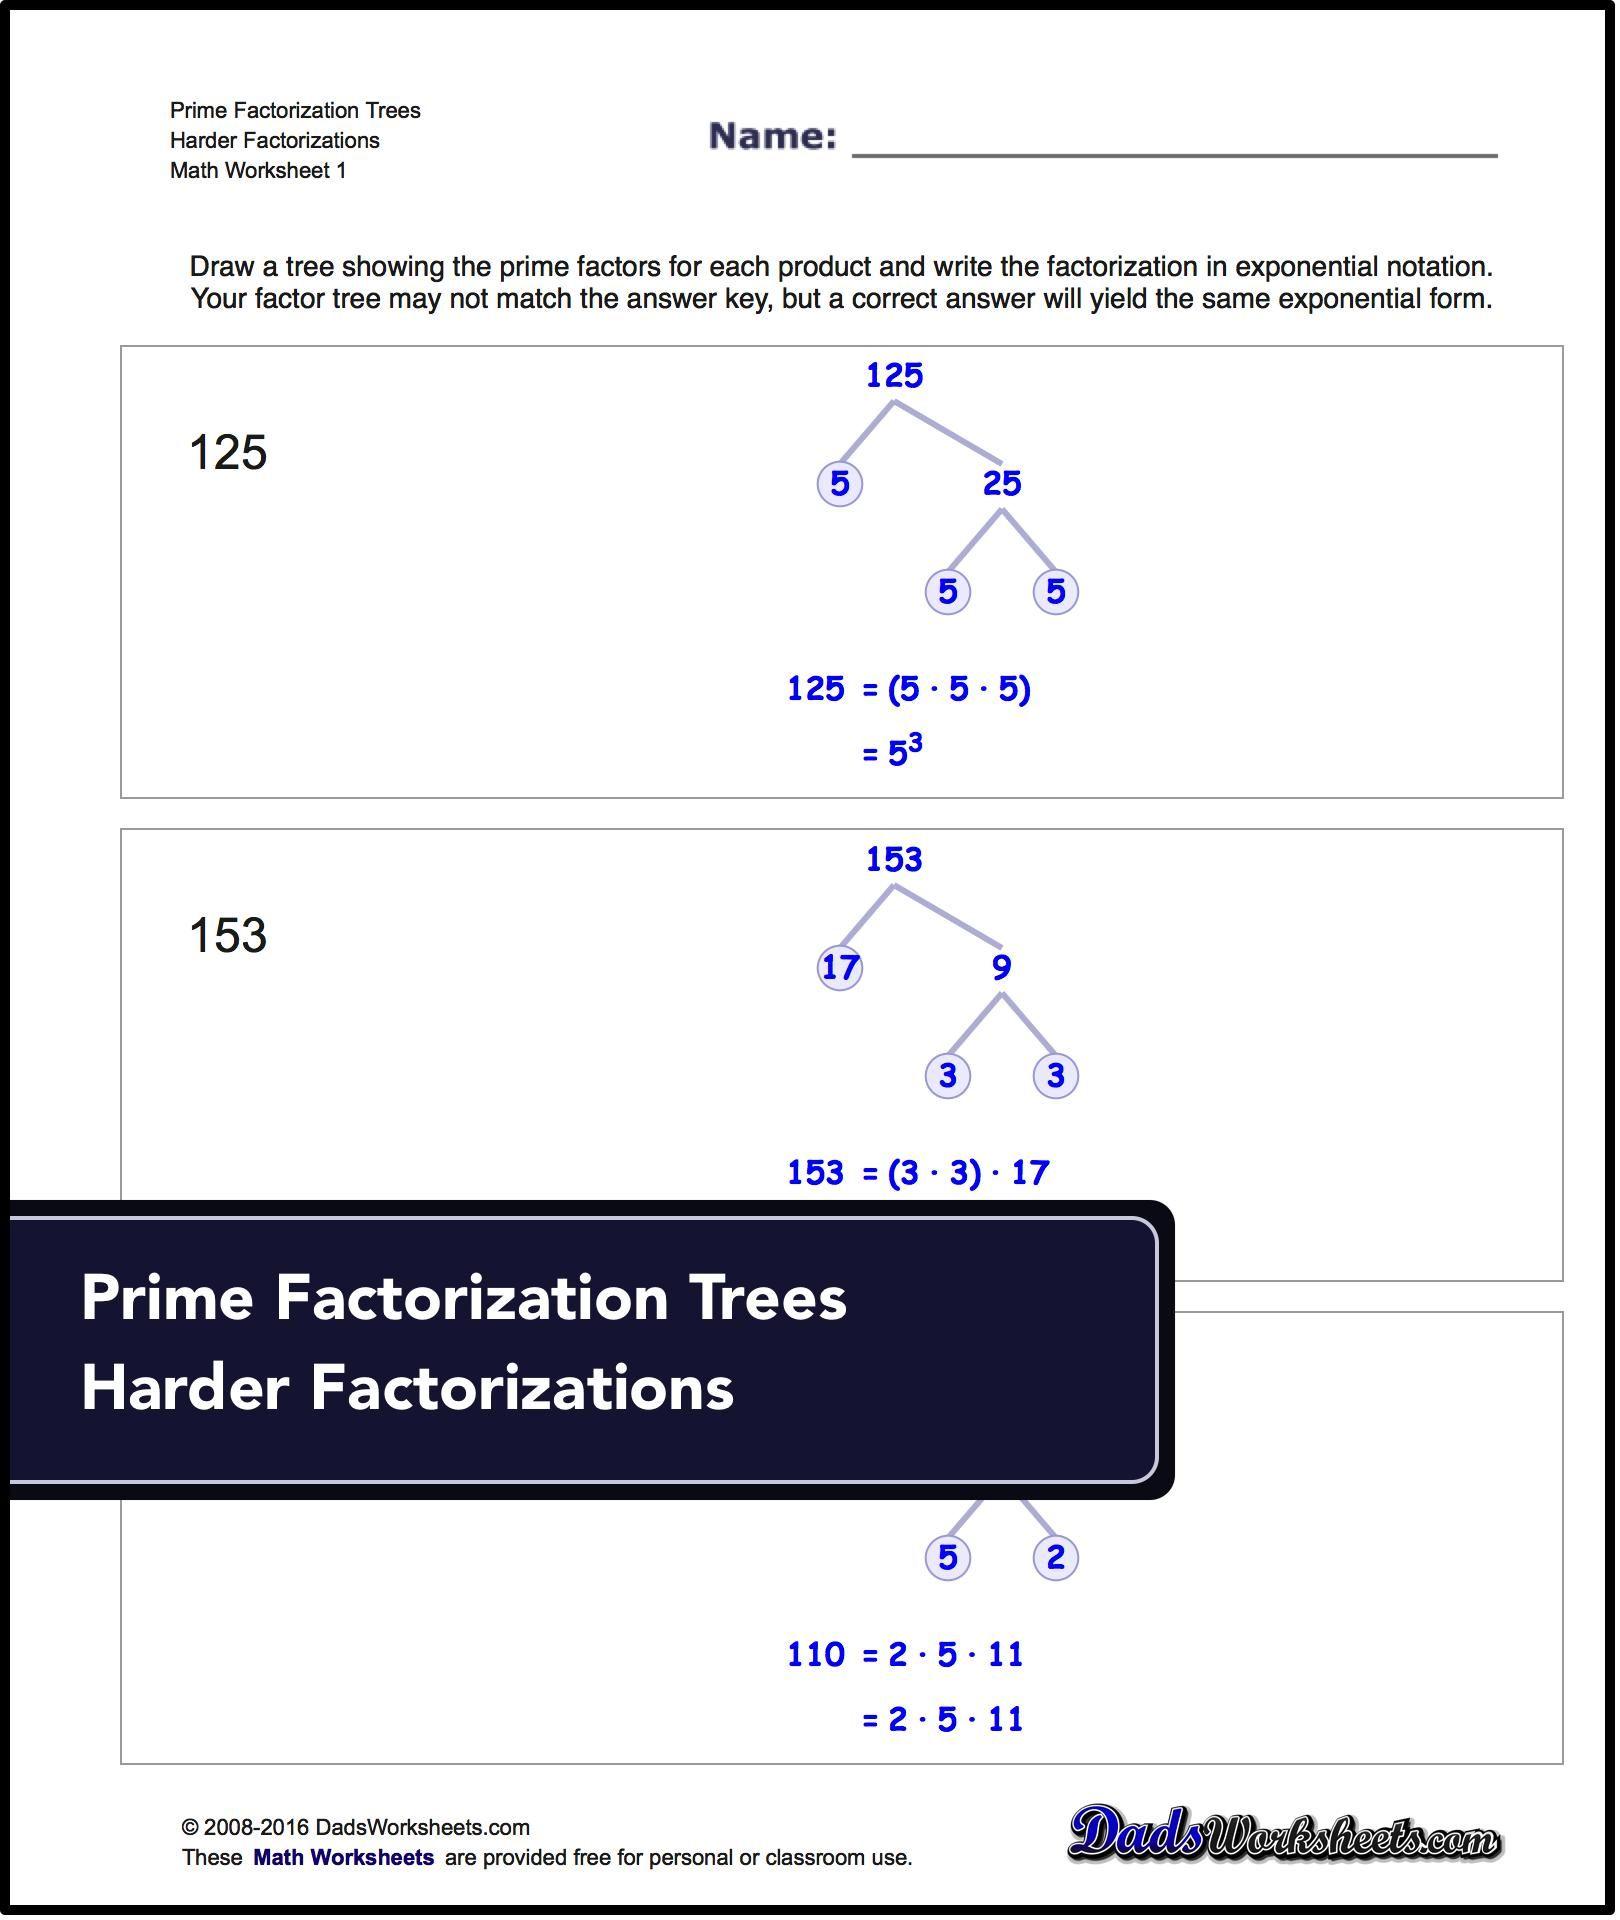 Factorization Gcd Lcm For Prime Factorization Trees